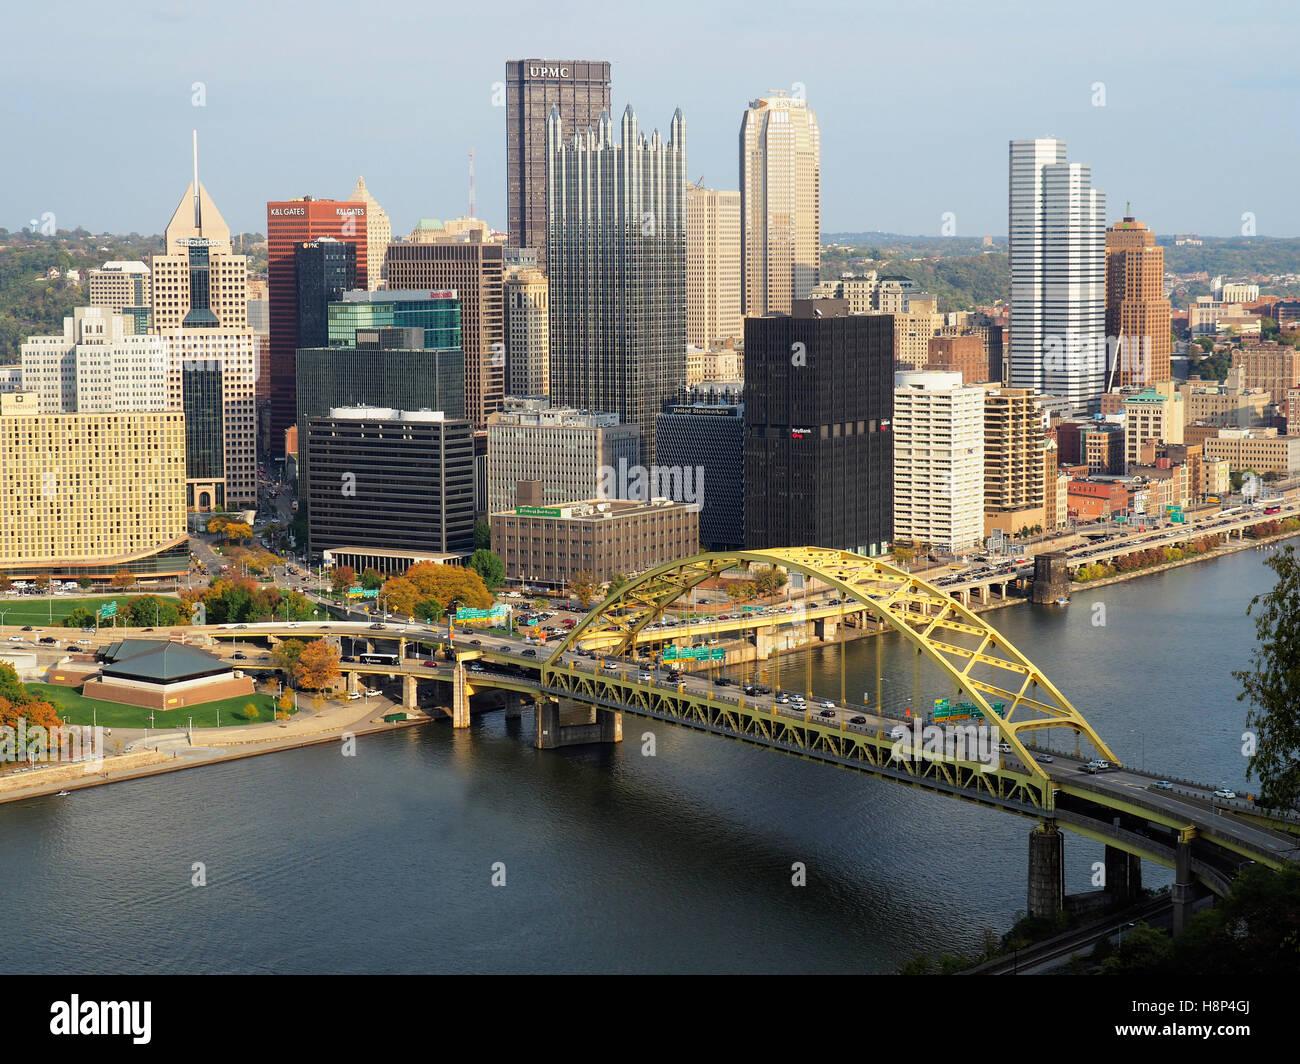 Pittsburgh downtown skyline with highway bridge over Monongahela River. - Stock Image